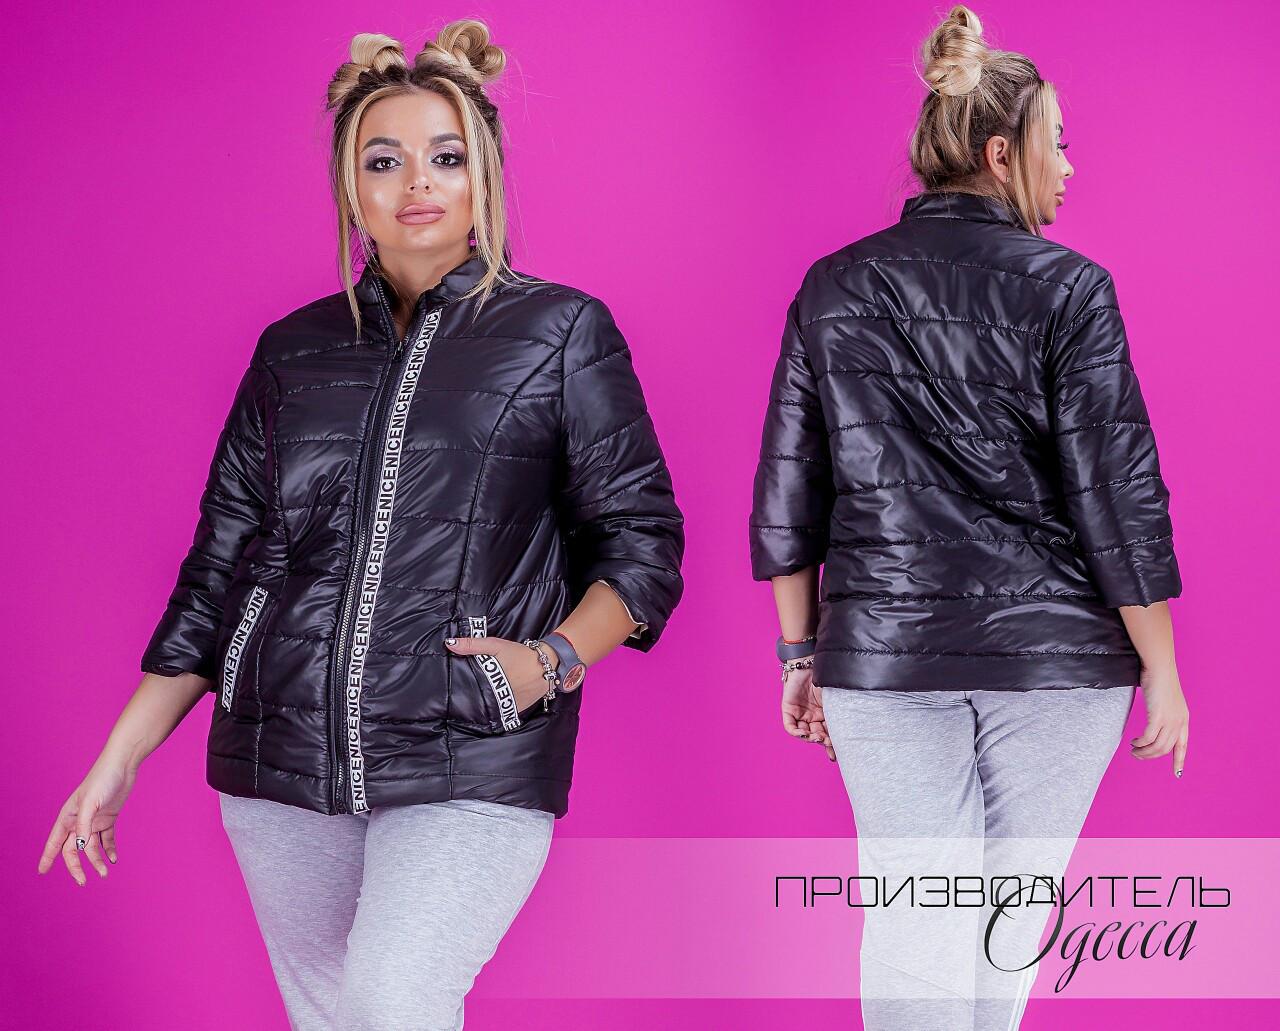 e3f3a0ea282 Женская куртка больших размеров от 44 до 54 рукав три четверти на синтепоне   3 цвета